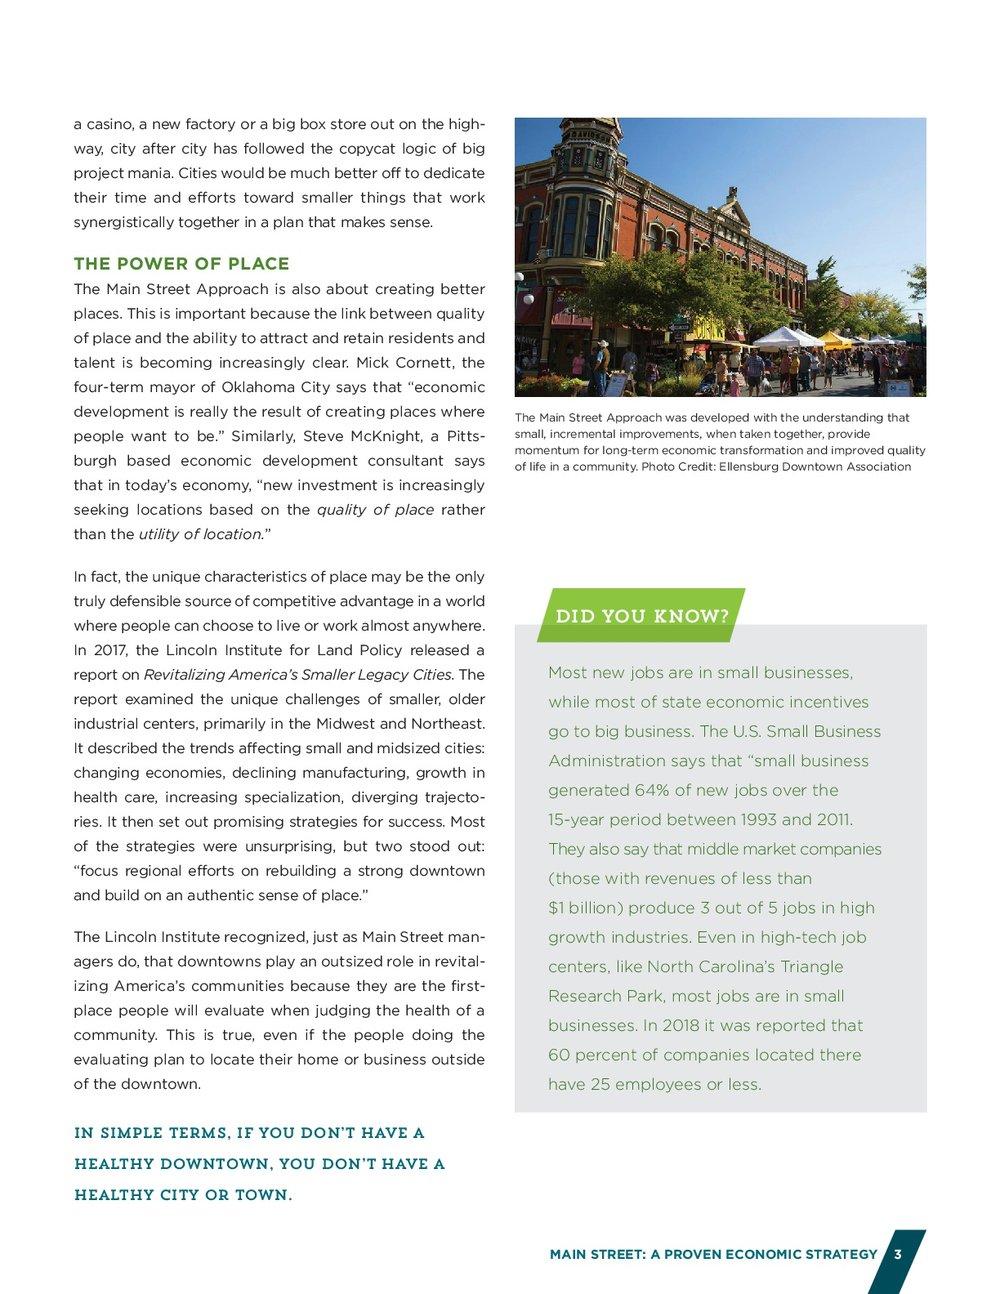 Main_Street_A_Proven_Economic_Development_Strategy-003[1].jpg